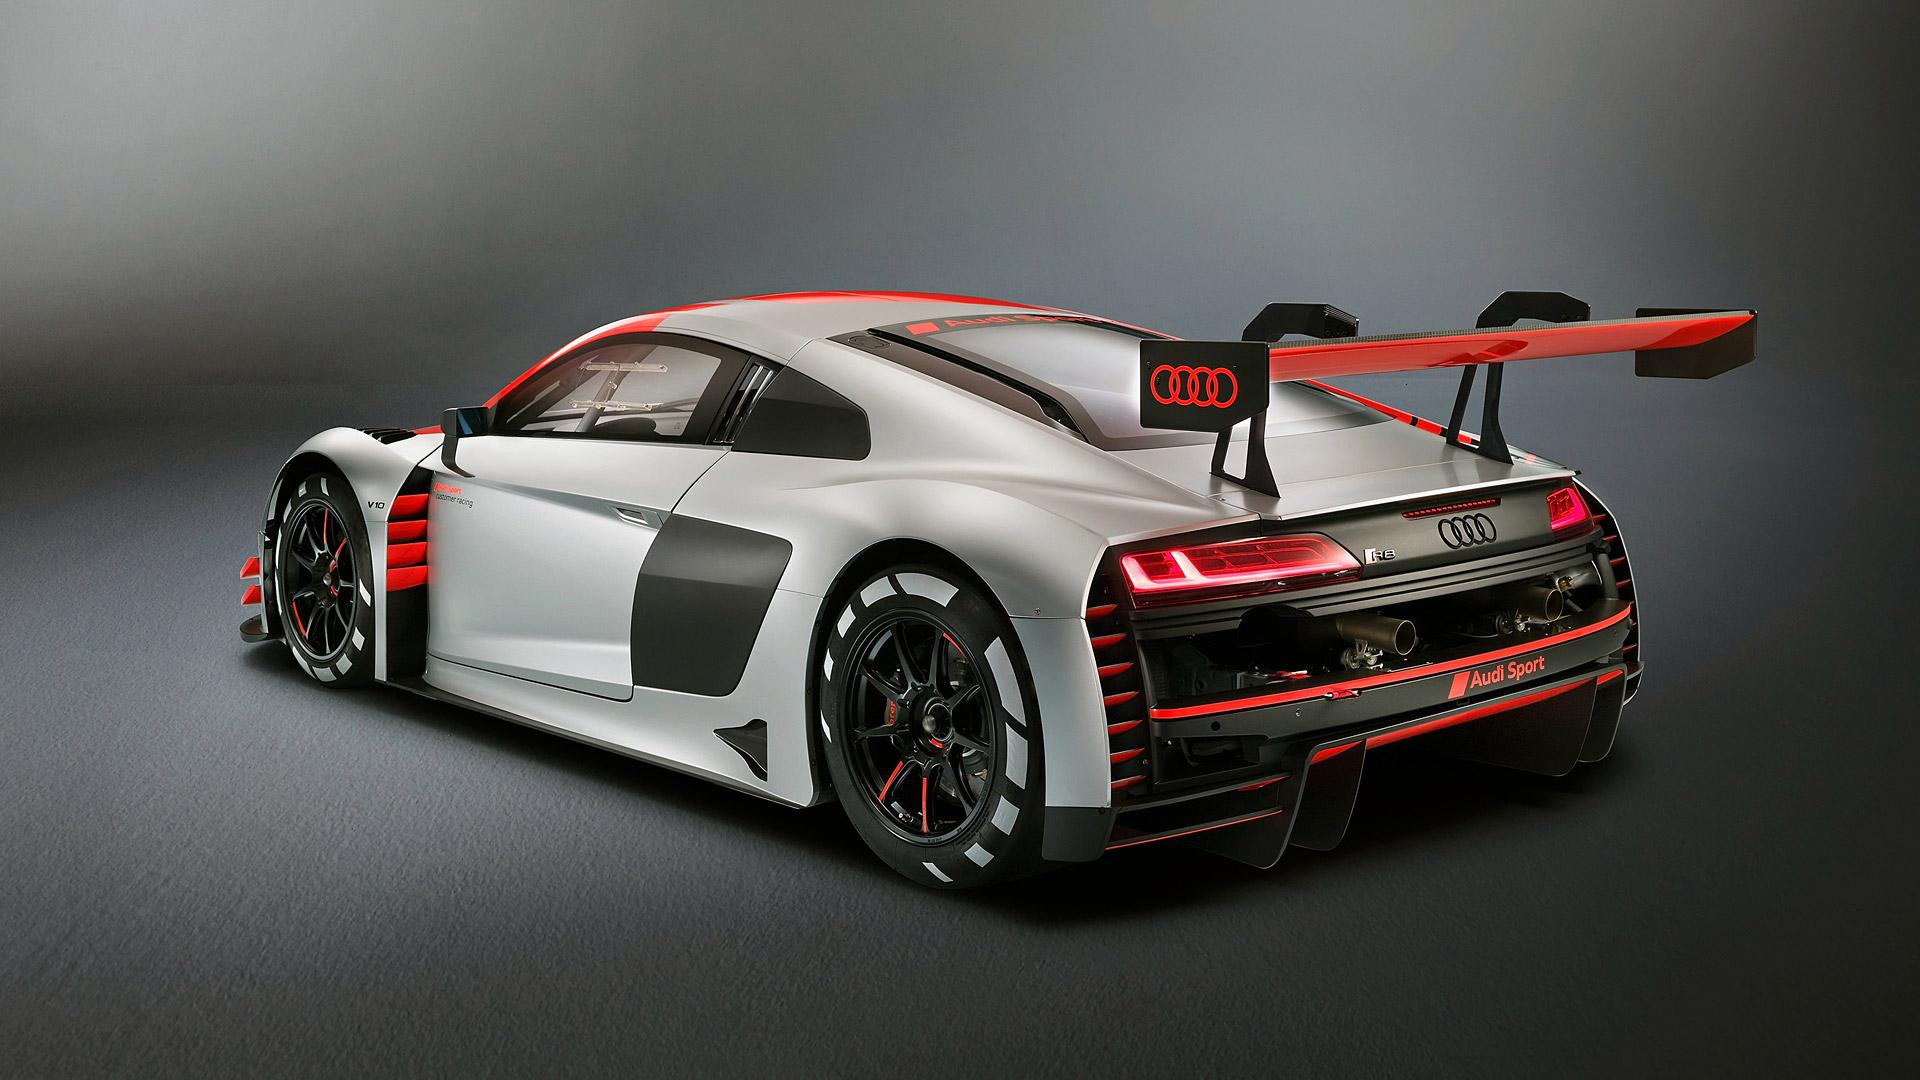 2019 Audi R8 LMS GT3 Wallpapers Specs Videos   4K HD   WSupercars 1920x1080